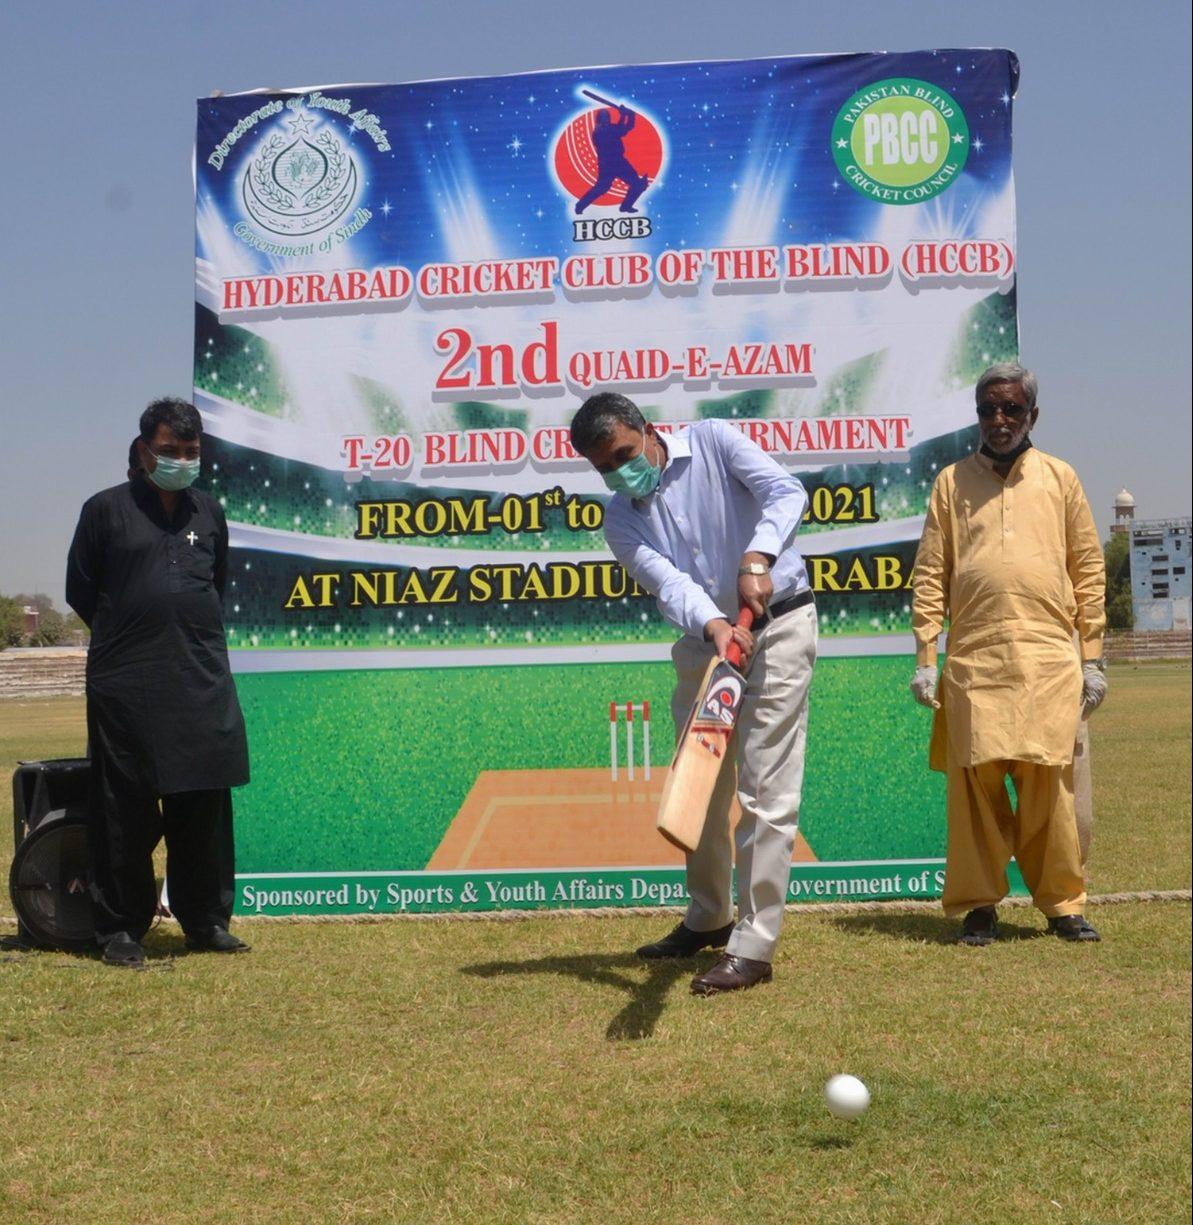 Quaid-e-Azam T20 Blind Cricket Tournament Kicks Off In Hyderabad - Sindh Courier-1